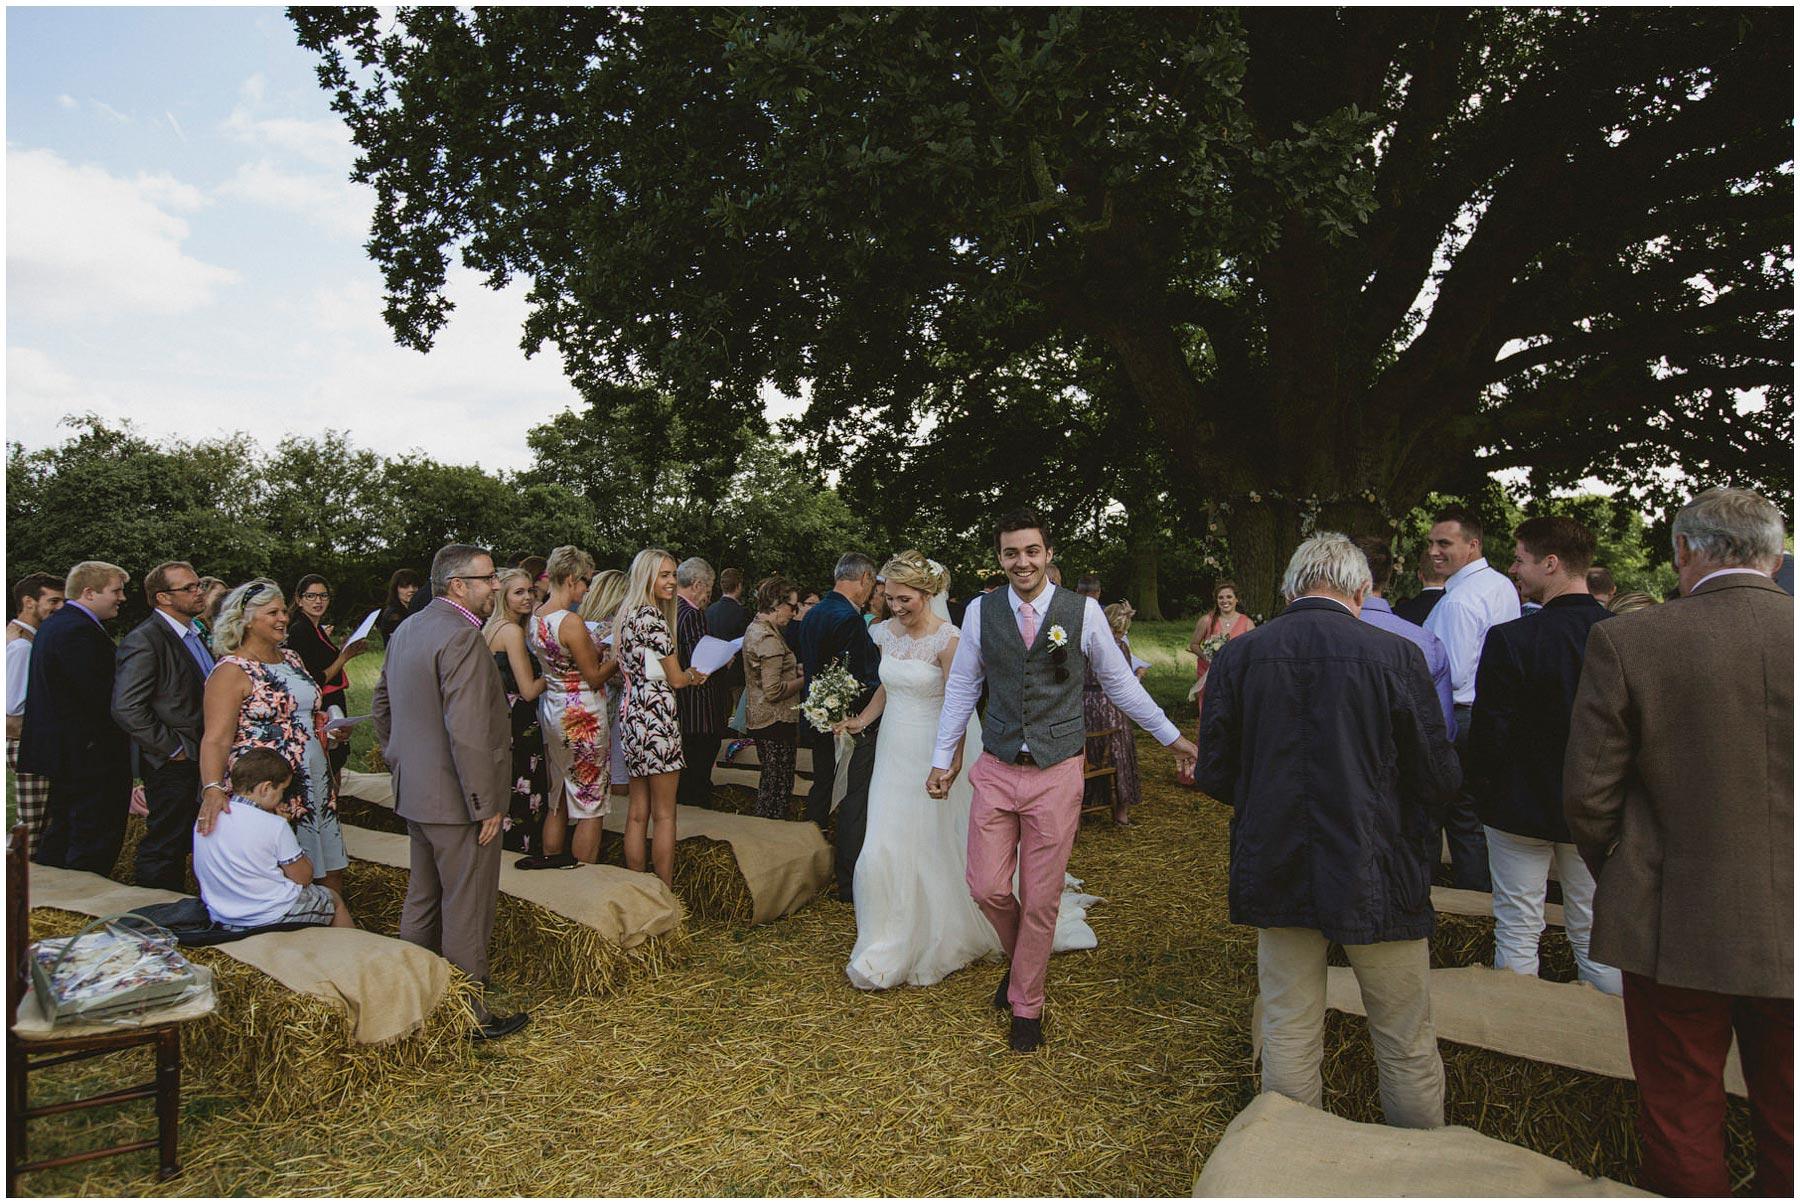 Kent-Festival-Tipi-wedding-photography_0081